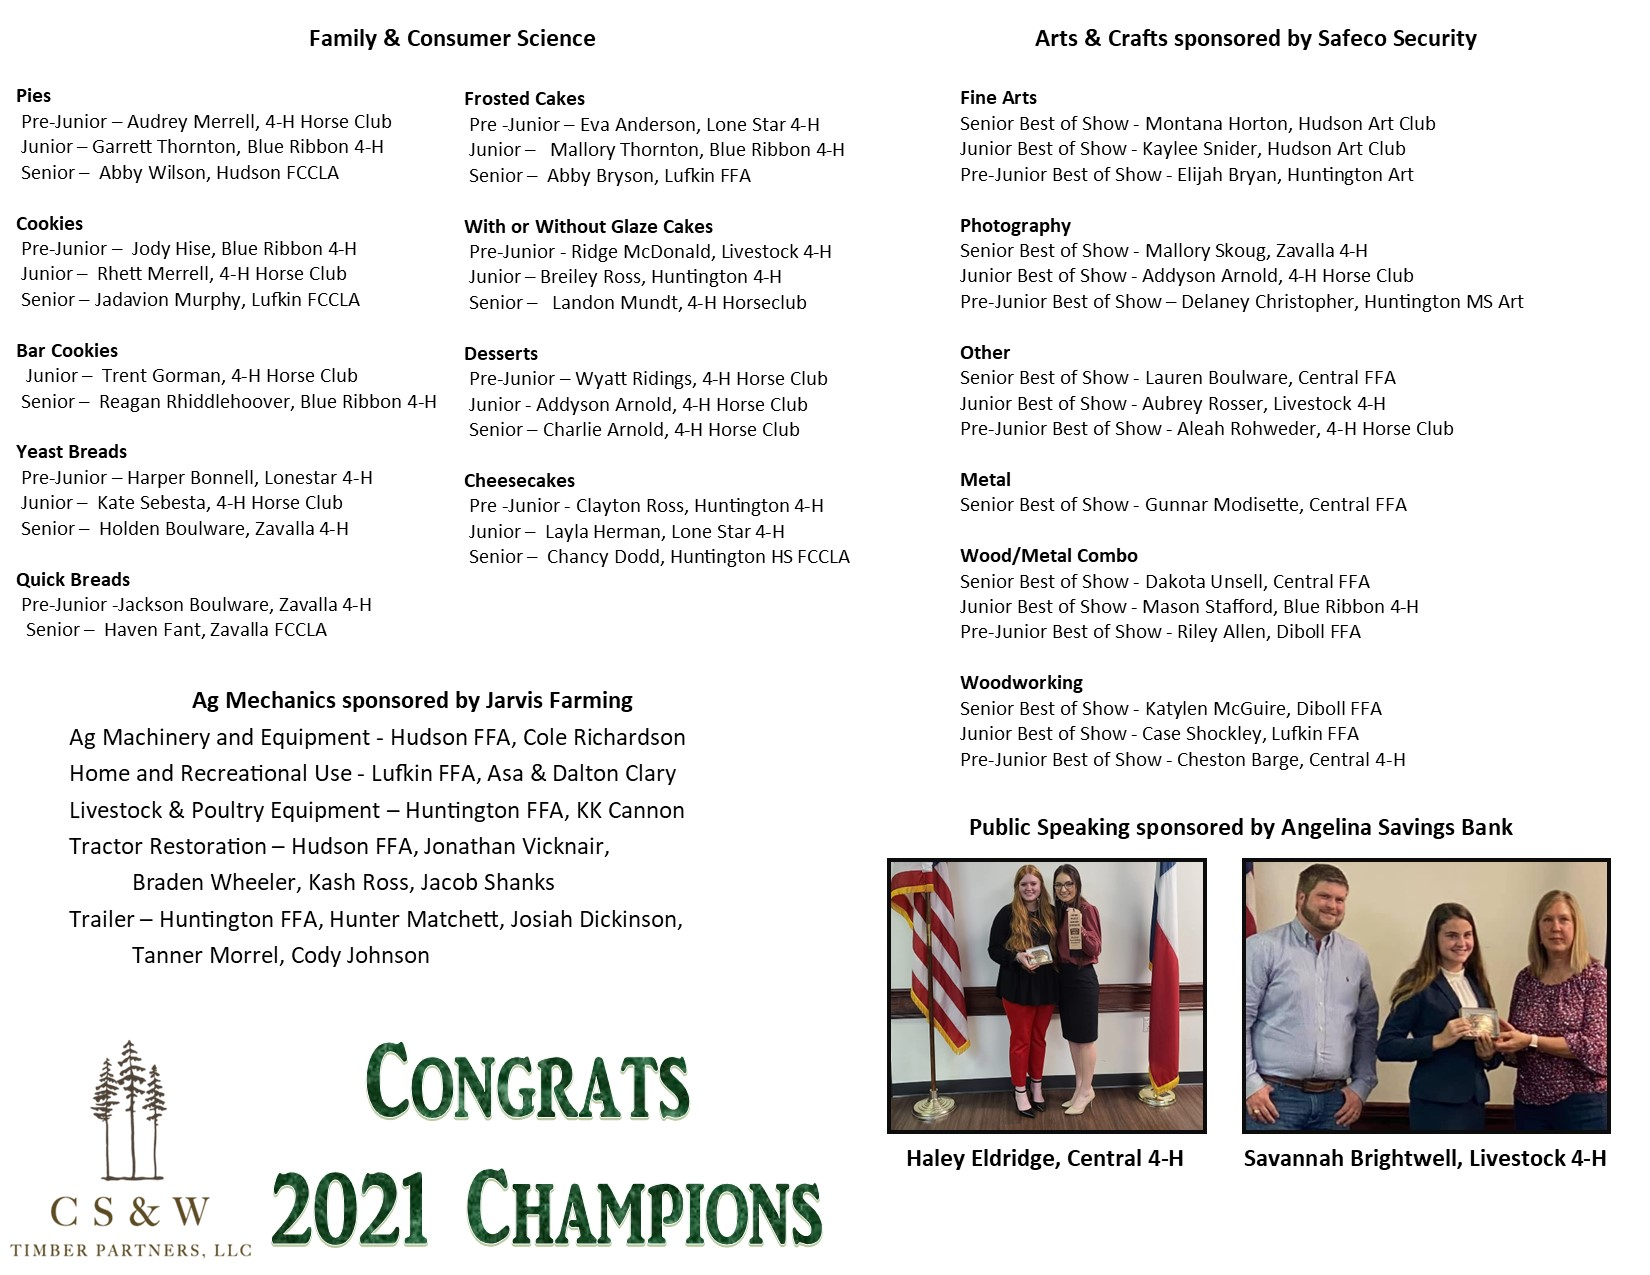 Champions board 2021 pg 3